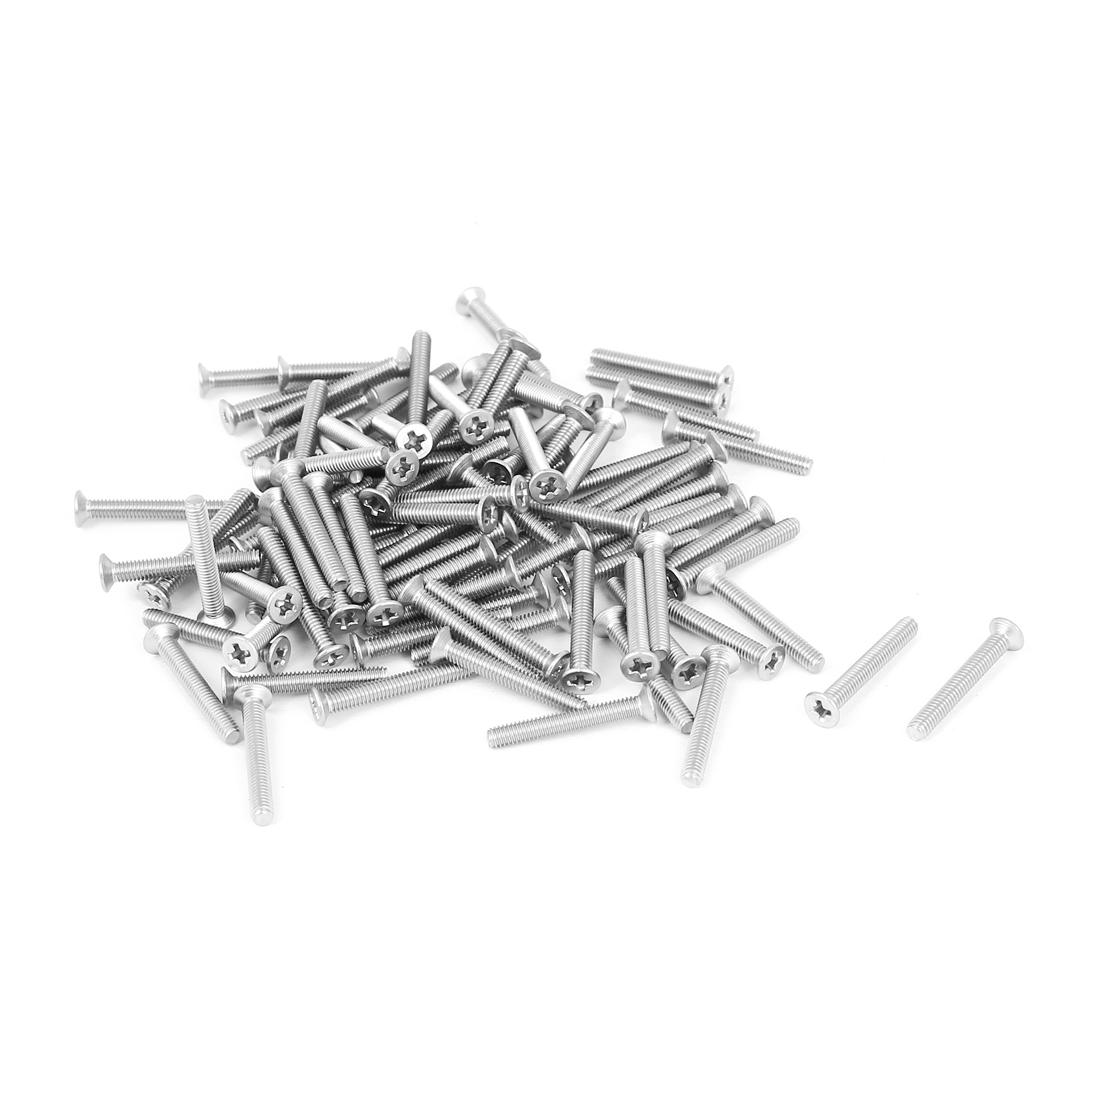 M2.5x18mm Stainless Steel Phillips Flat Countersunk Head Screws 100pcs